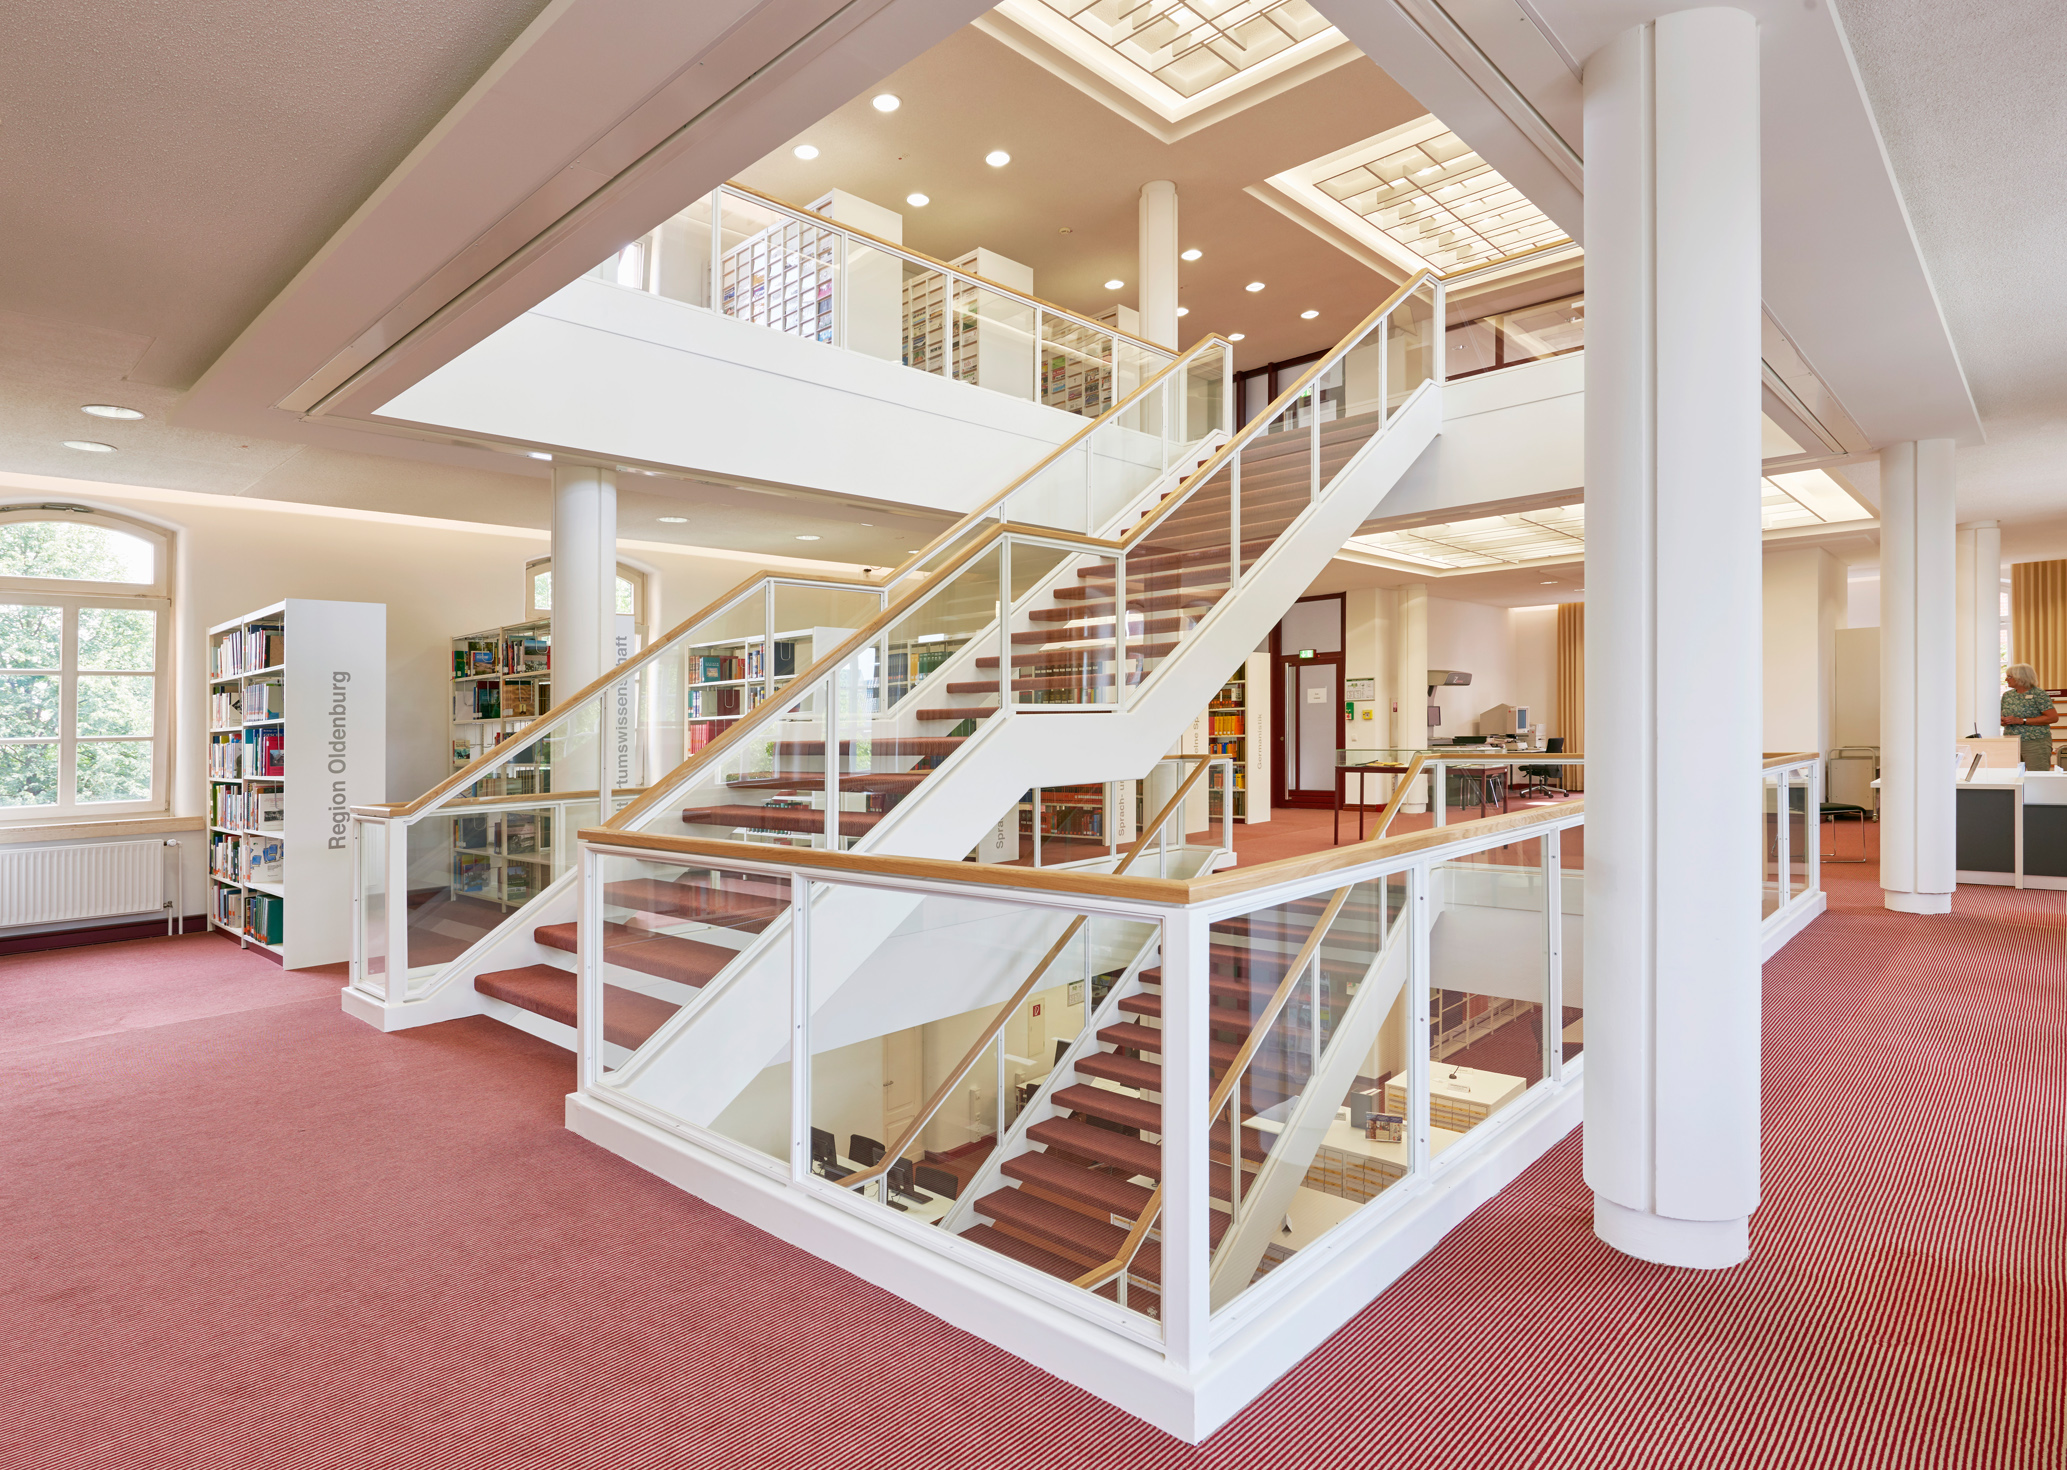 Landesbibliothek Oldenburg – kbg architekten